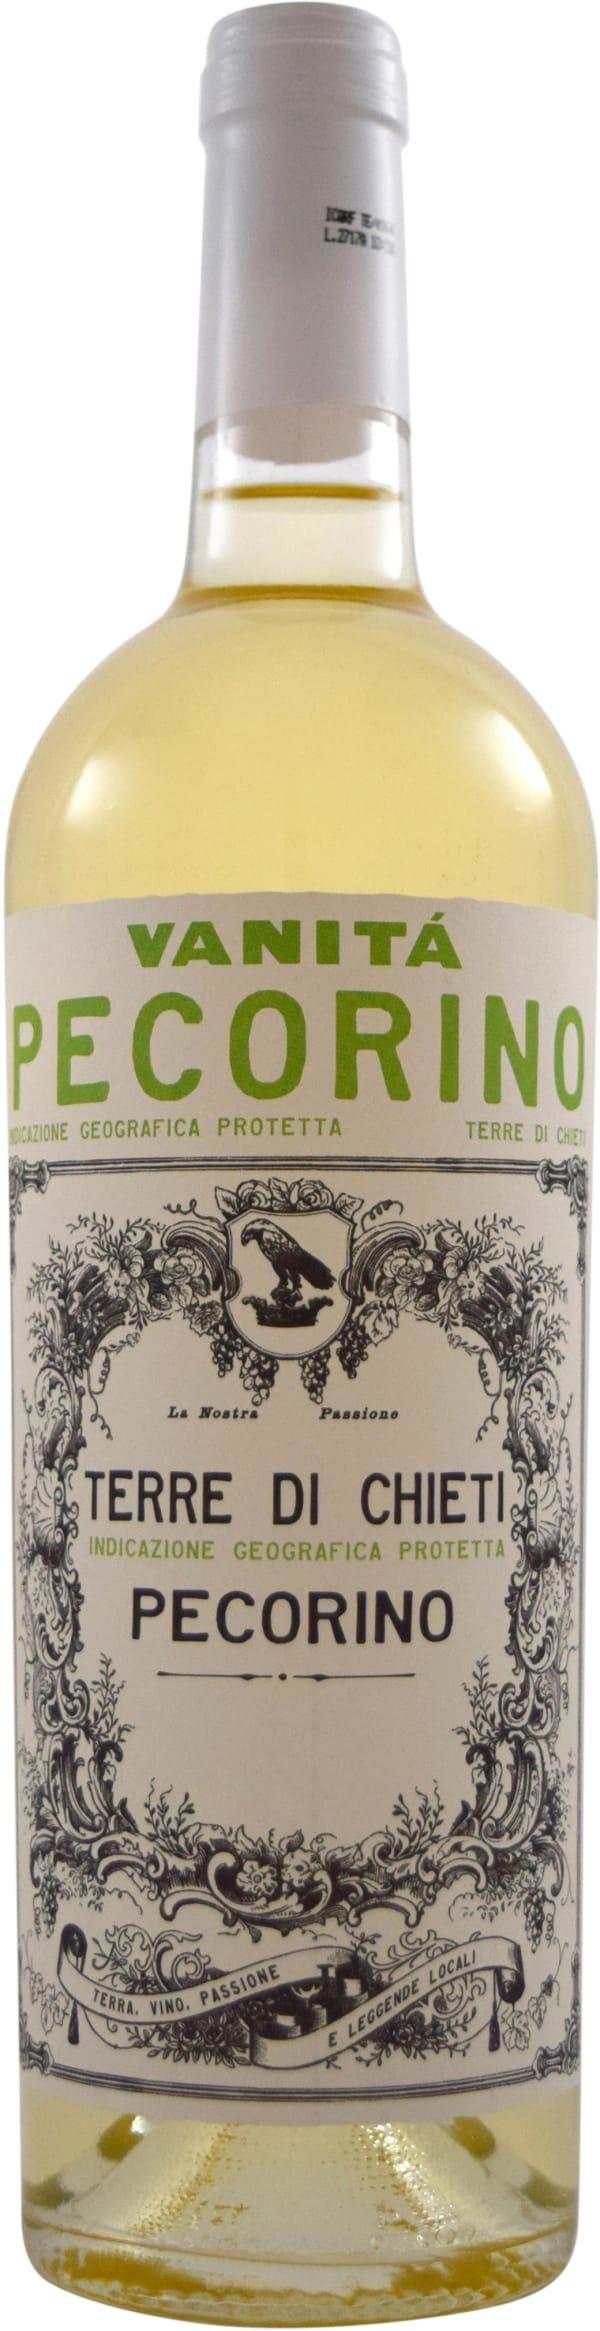 Vanitá Pecorino 2018